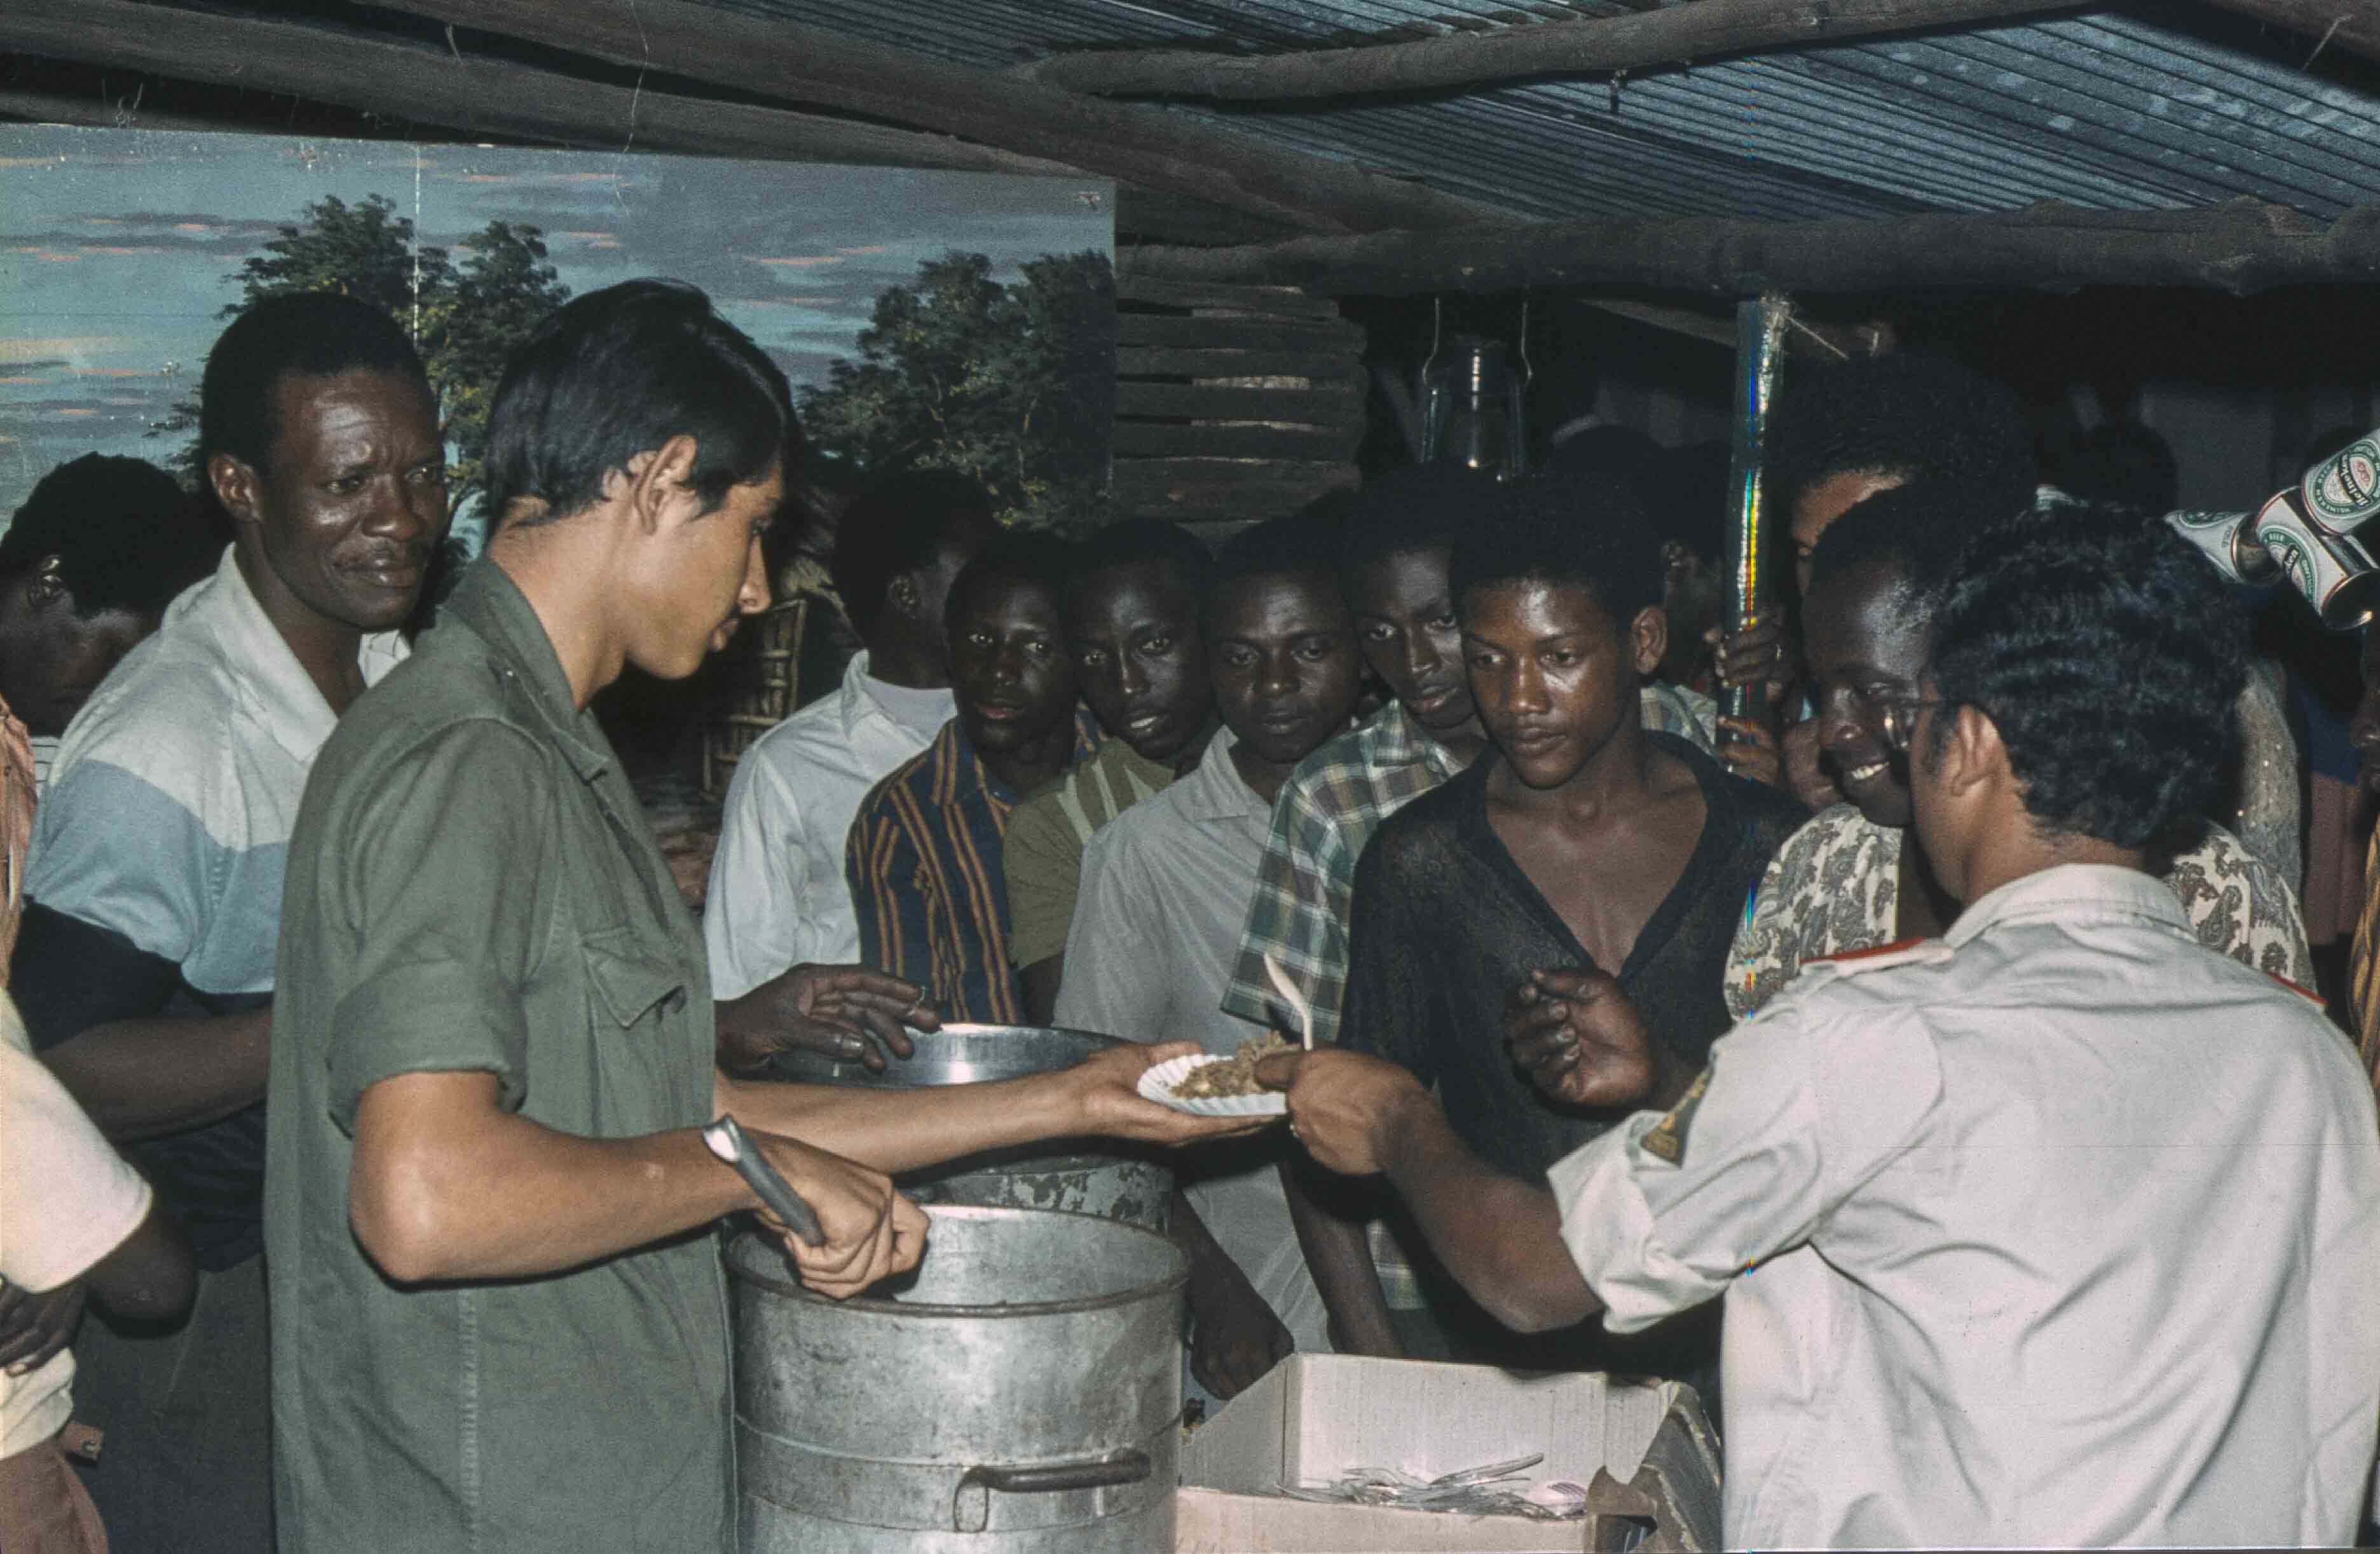 532. Suriname